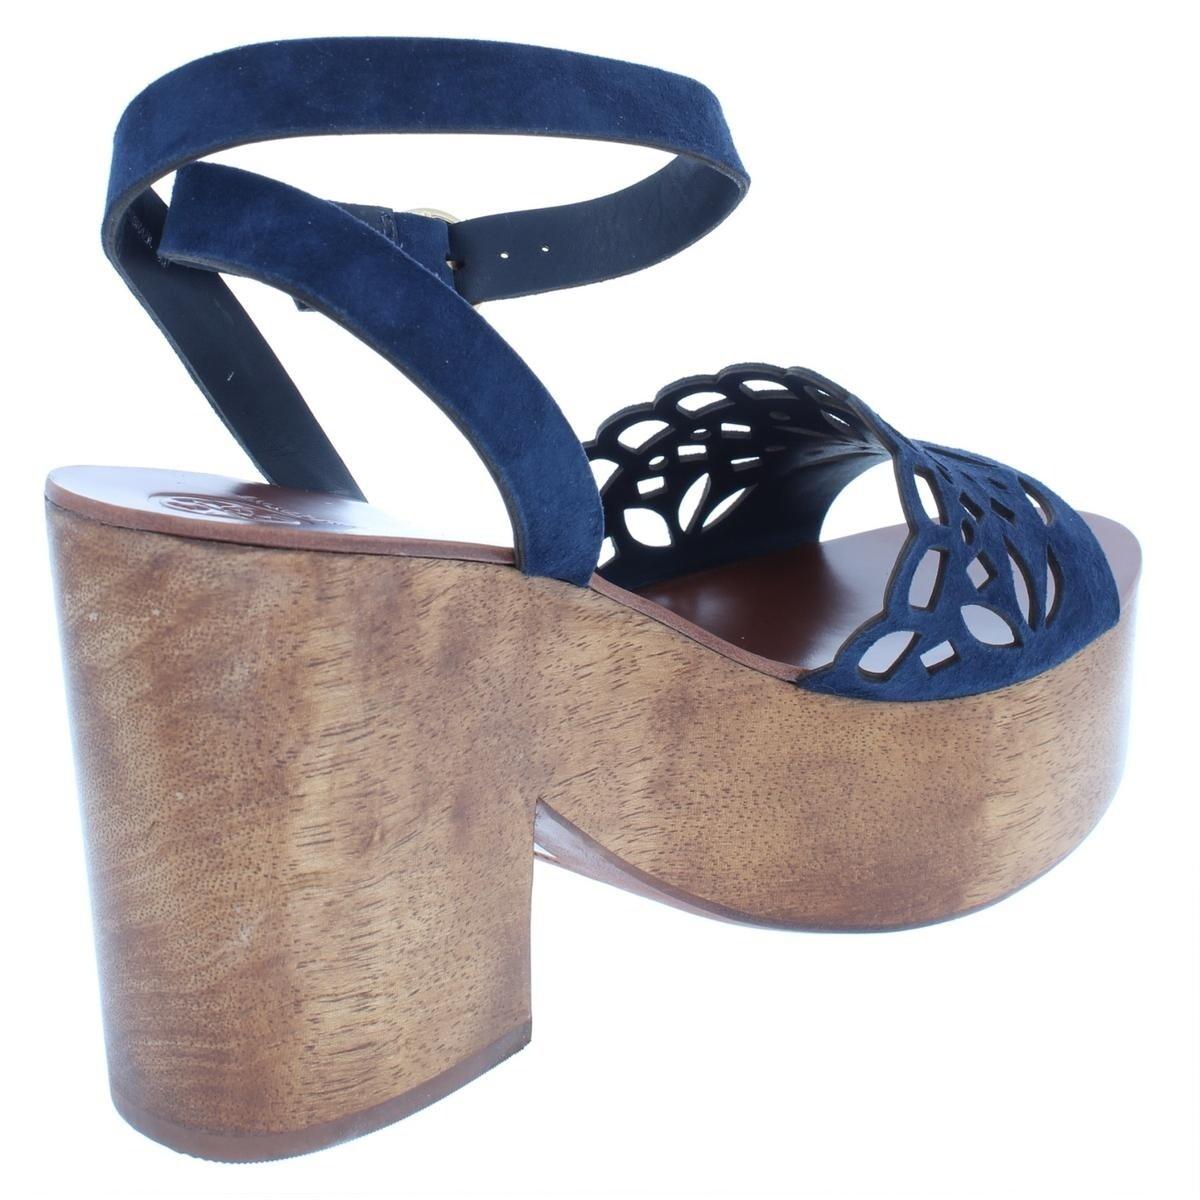 de357b488 Shop Tory Burch Womens May Platform Sandals Suede Block Heel - Free  Shipping Today - Overstock - 26049713